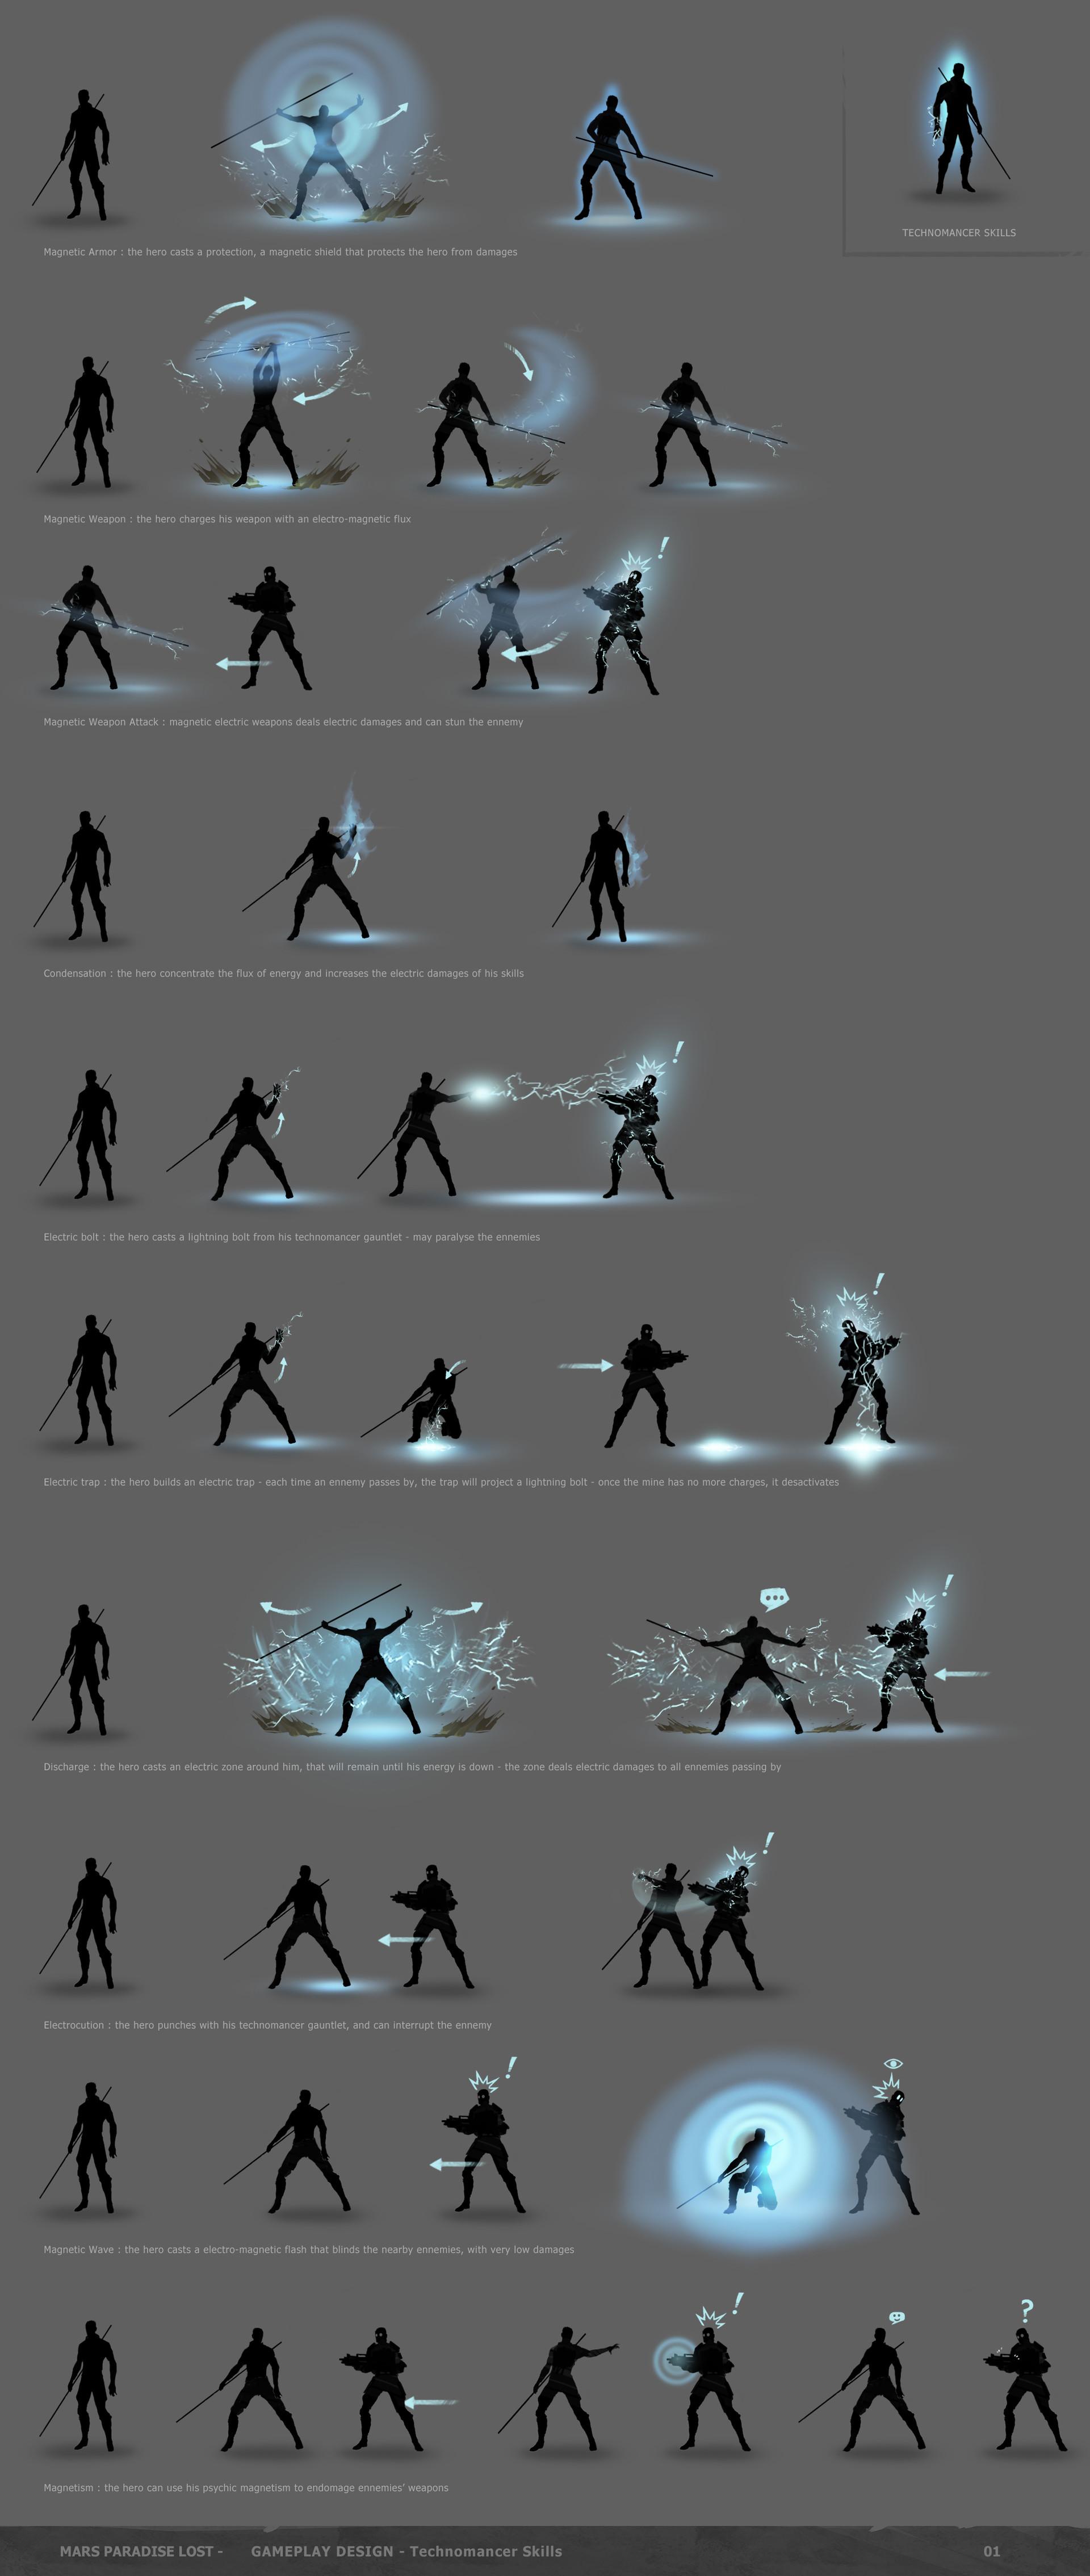 Alexandre chaudret mars2 gameplaydesign skills technomancer01